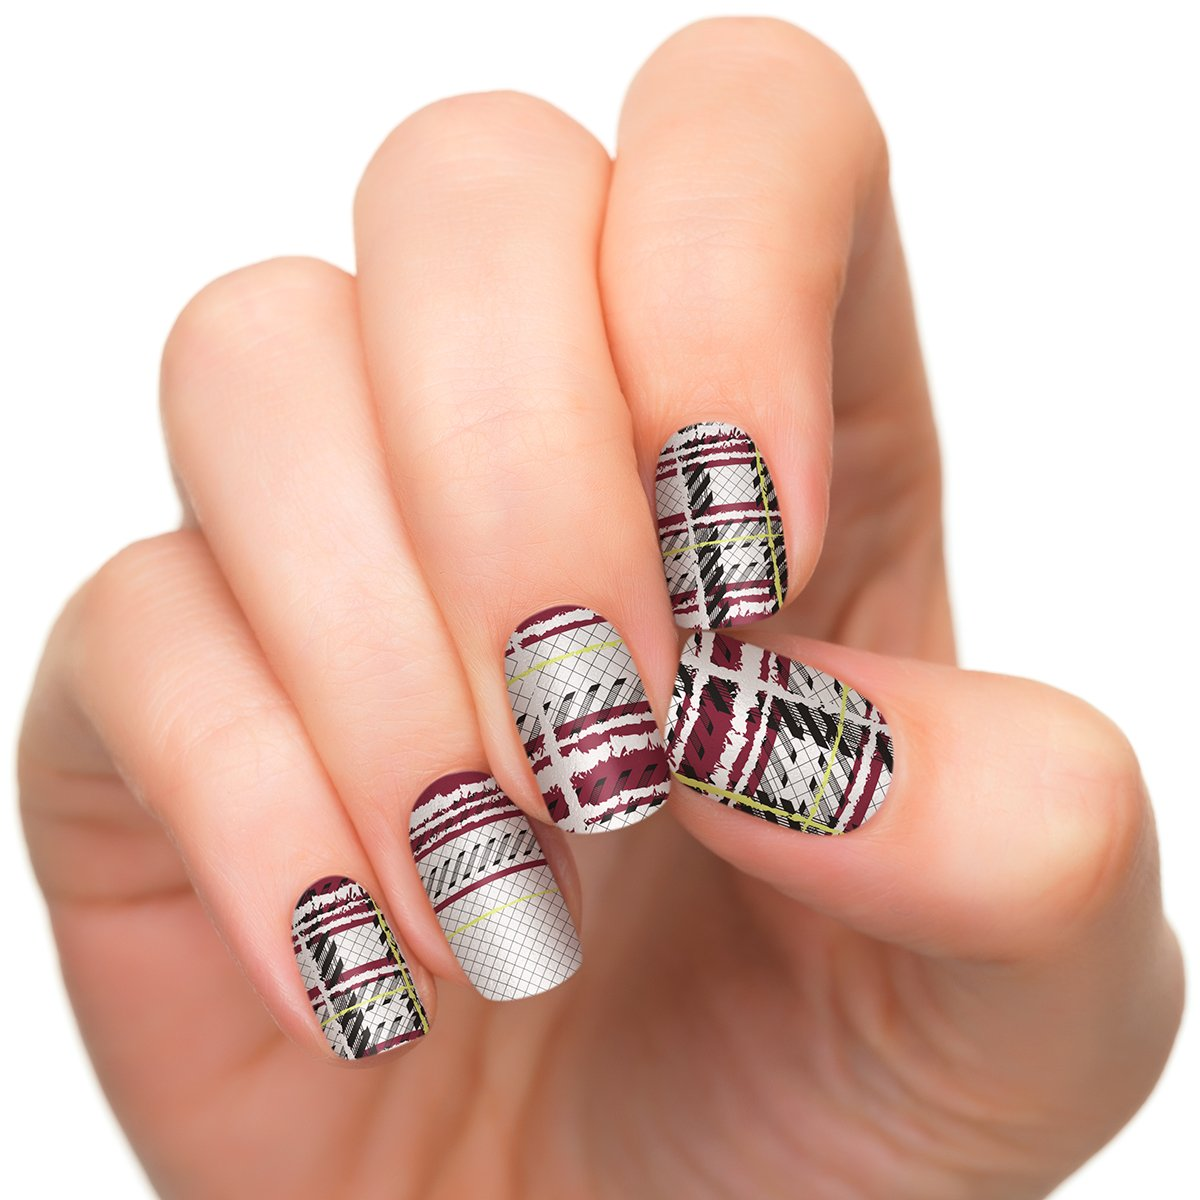 Incoco Nail Polish Strips, Nail Art, Prep School